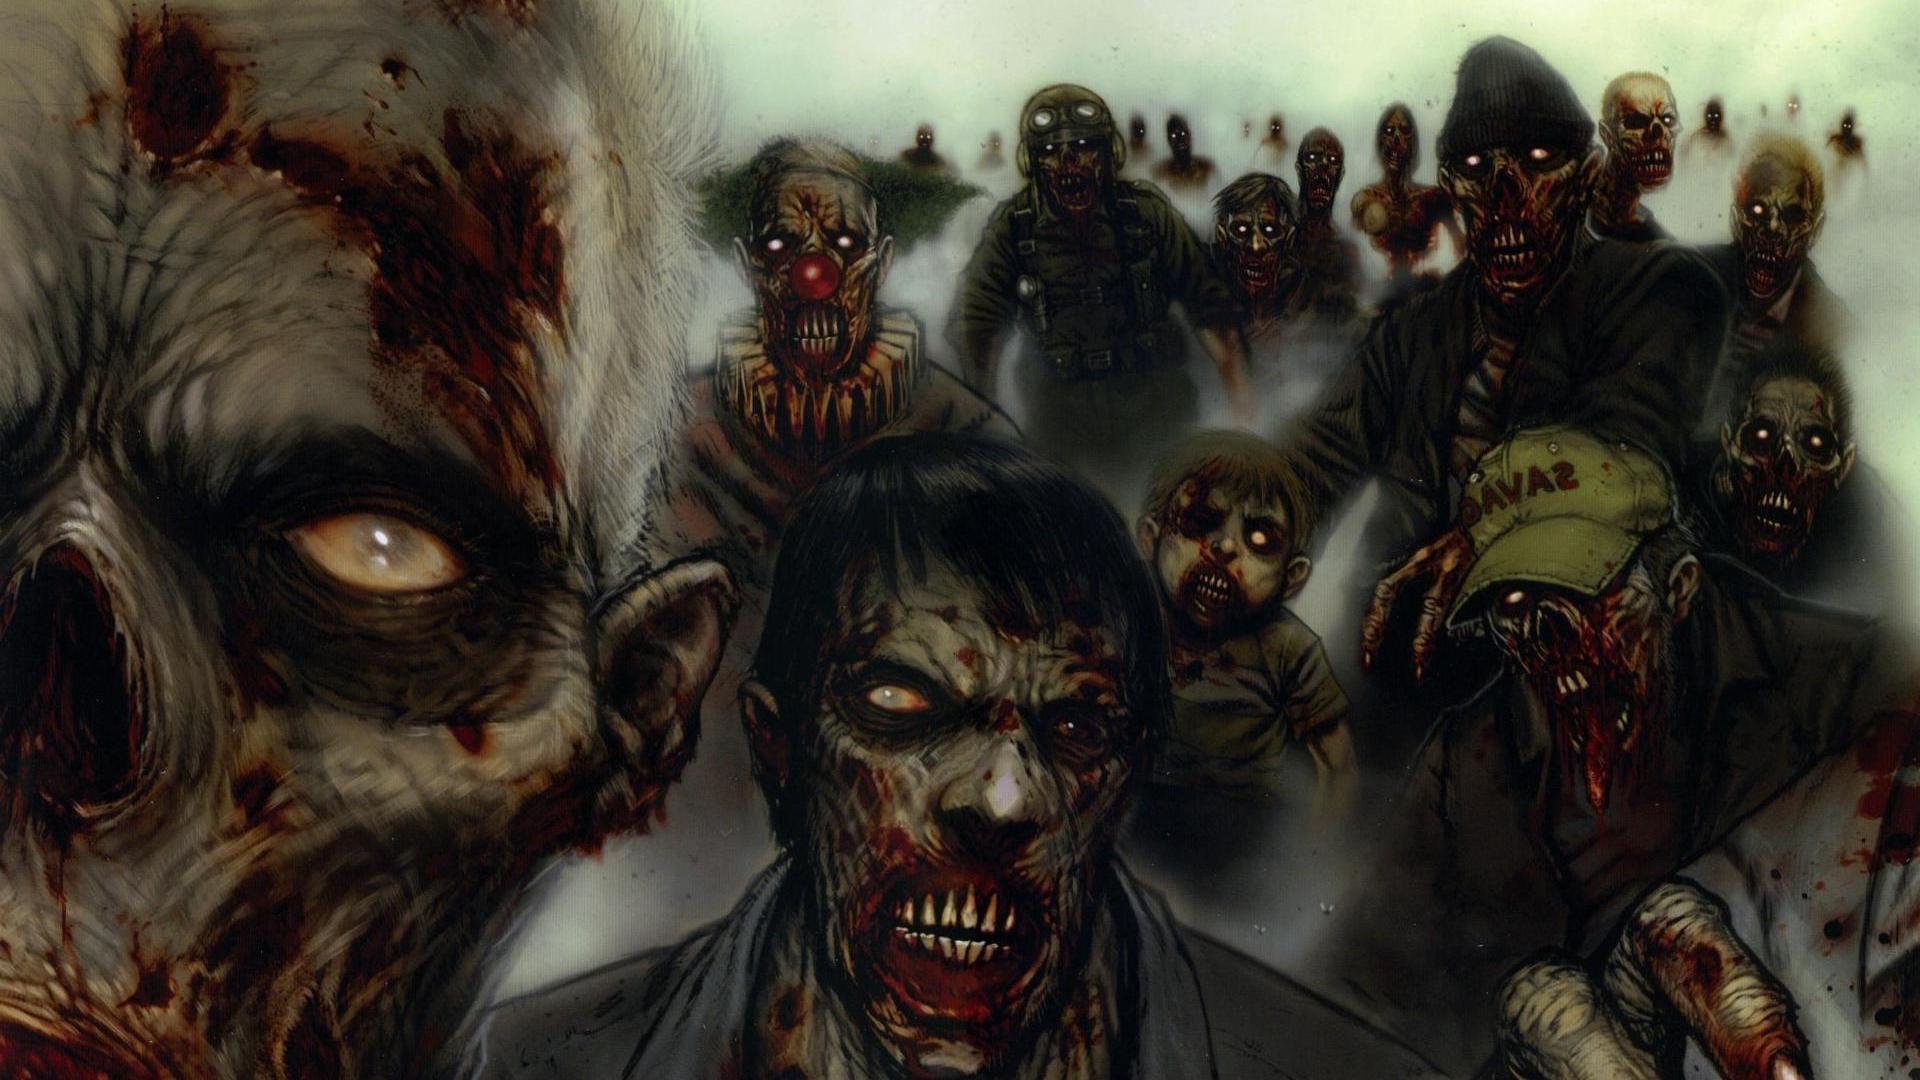 Free download Zombie Zombies Fantasy HD Wallpapers Desktop ...